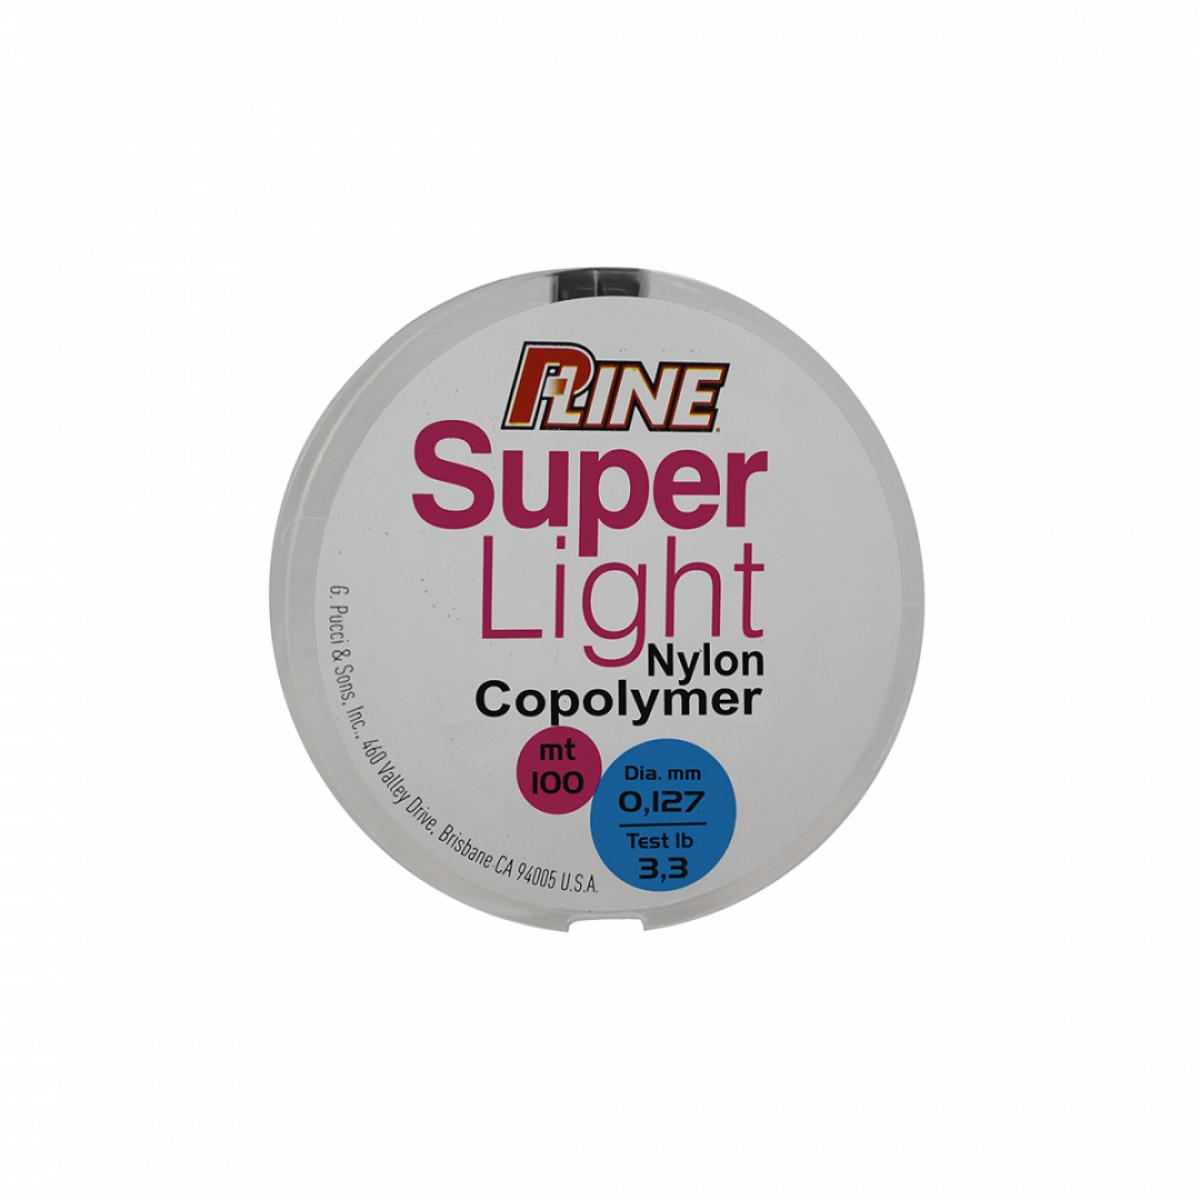 P-LINE SUPER LIGHT COPOLYMER 100M